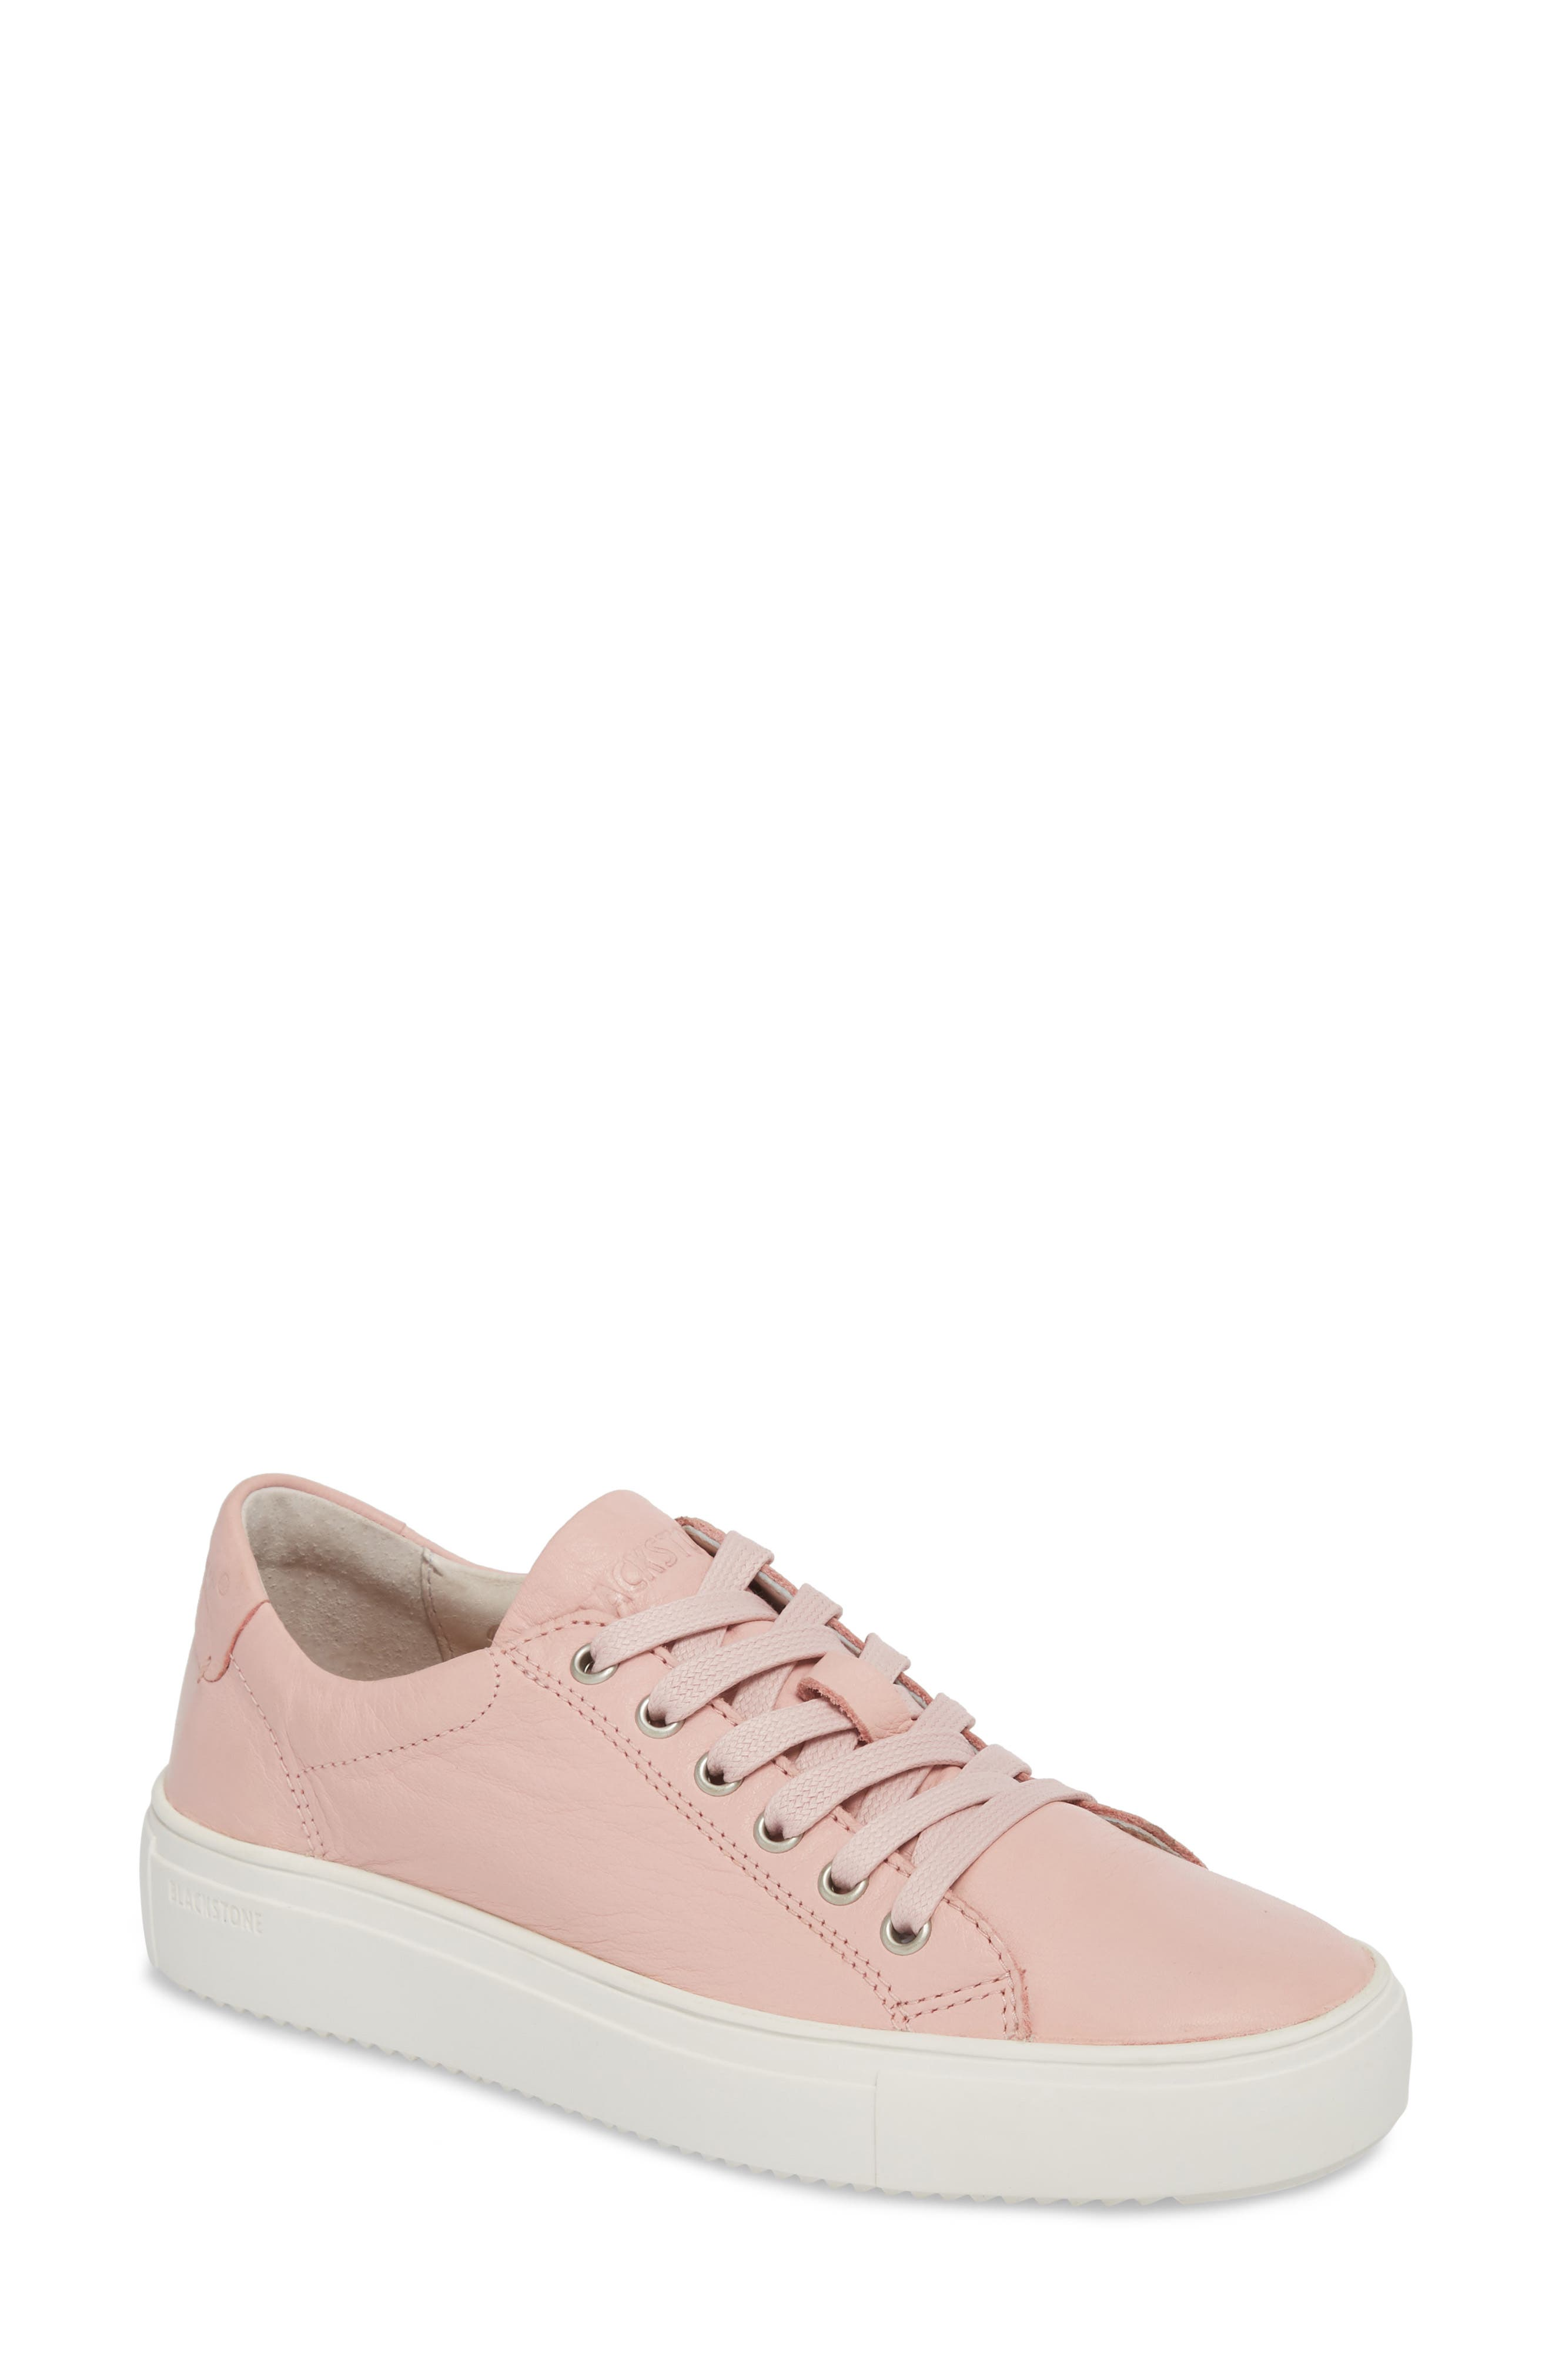 Blackstone Pl71 Low Top Sneaker, Pink